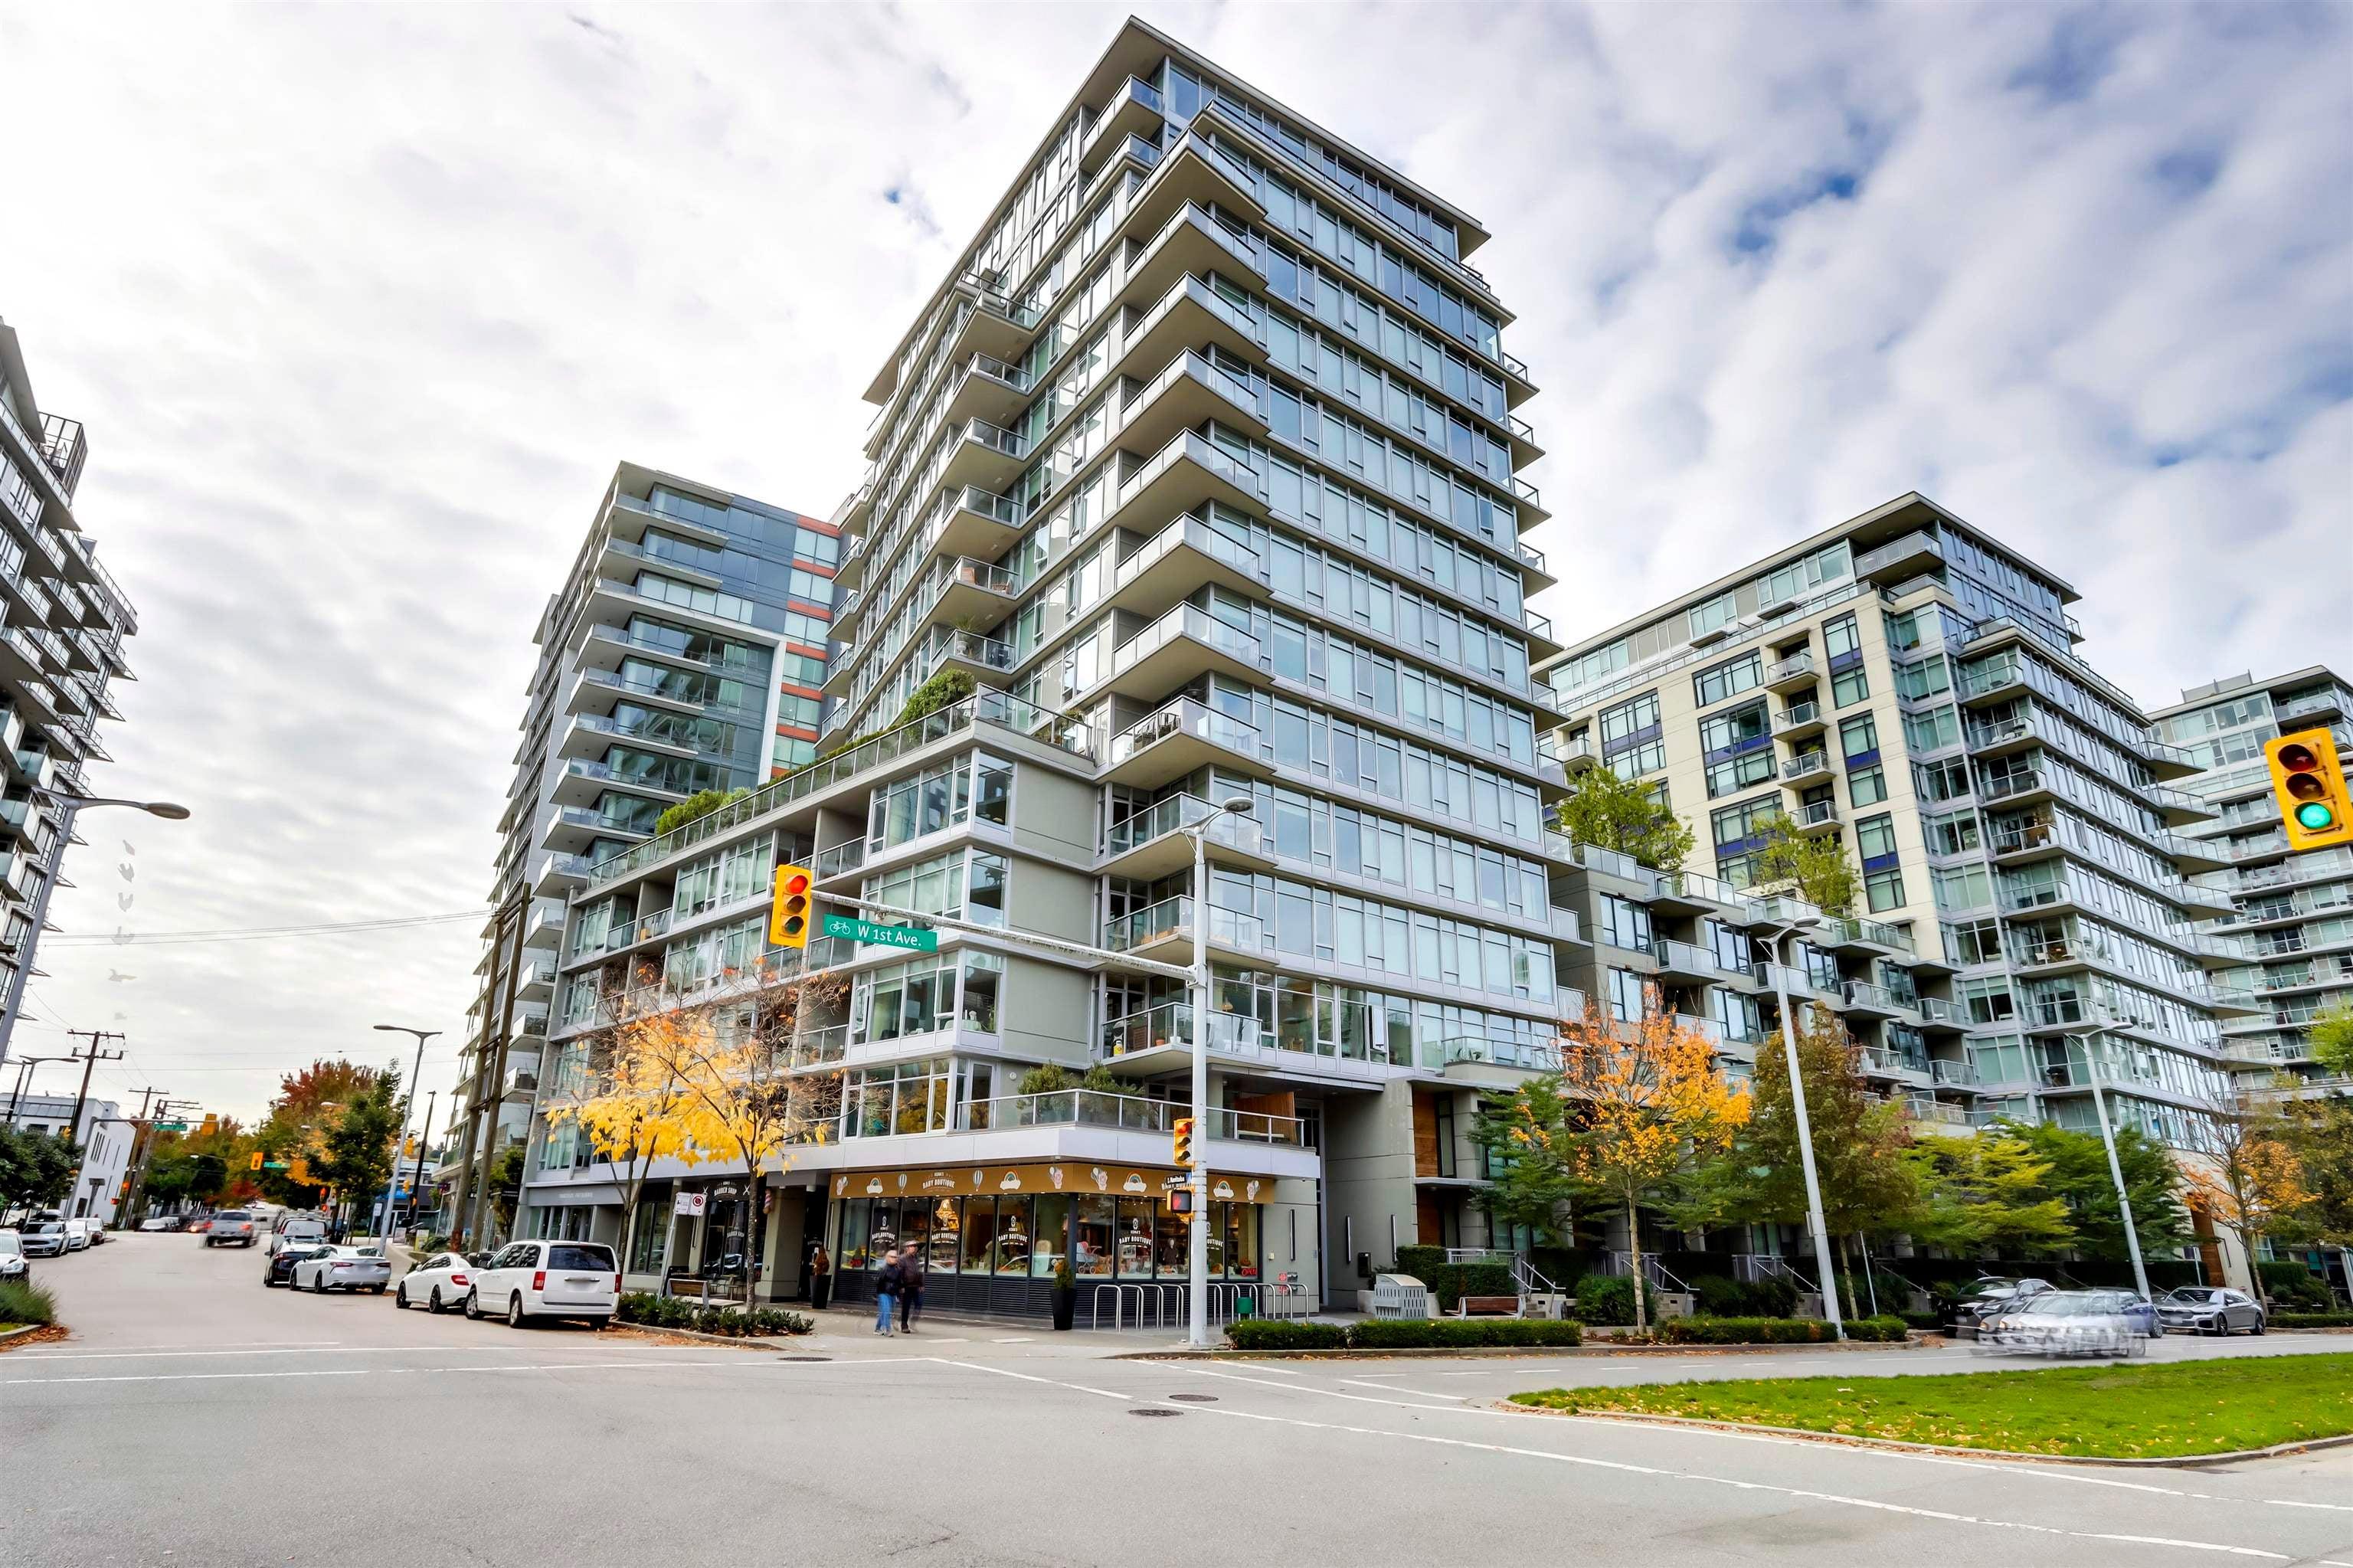 806 108 W 1ST AVENUE - False Creek Apartment/Condo for sale, 1 Bedroom (R2625628) - #1